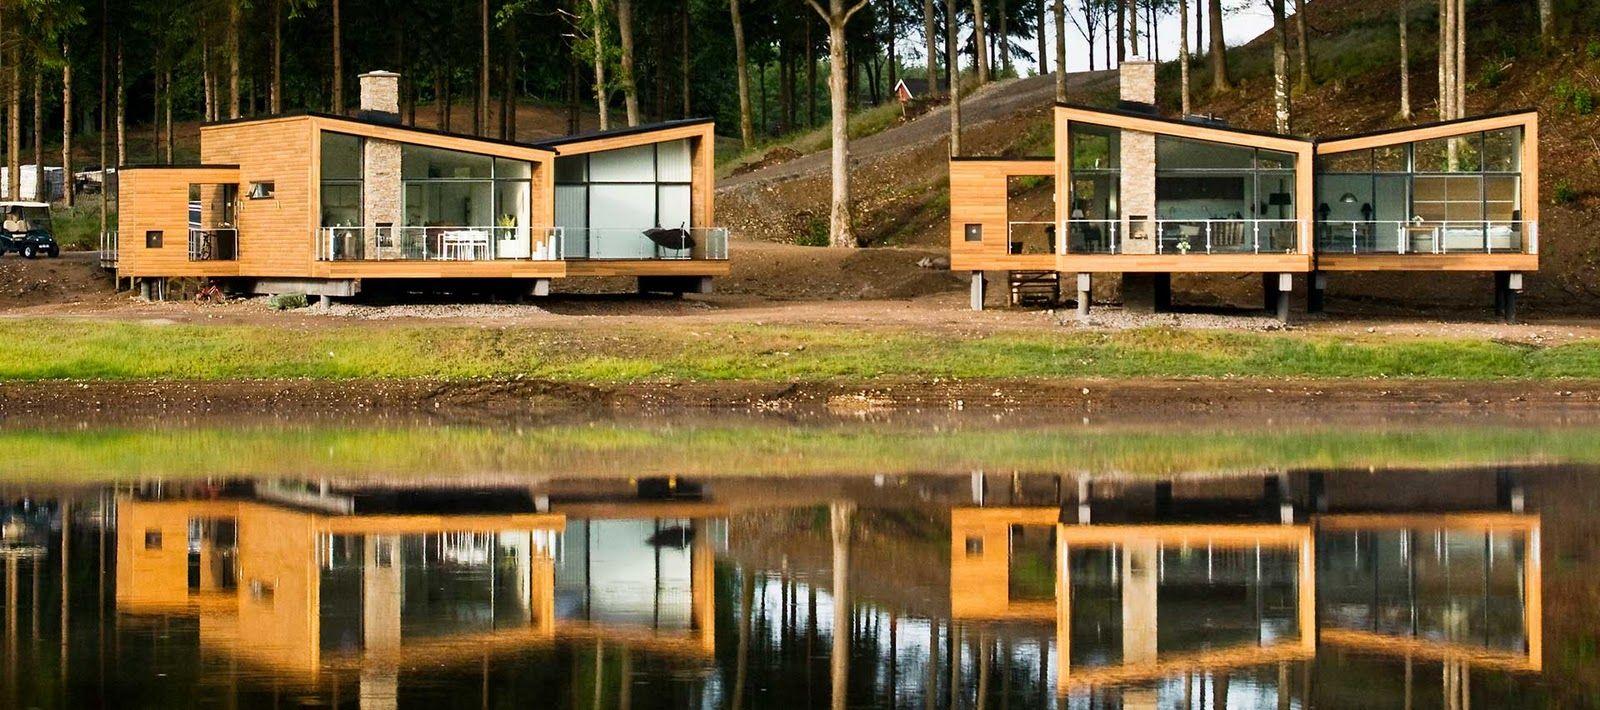 Modern house on wooden stilt supports google search for Modern house on stilts